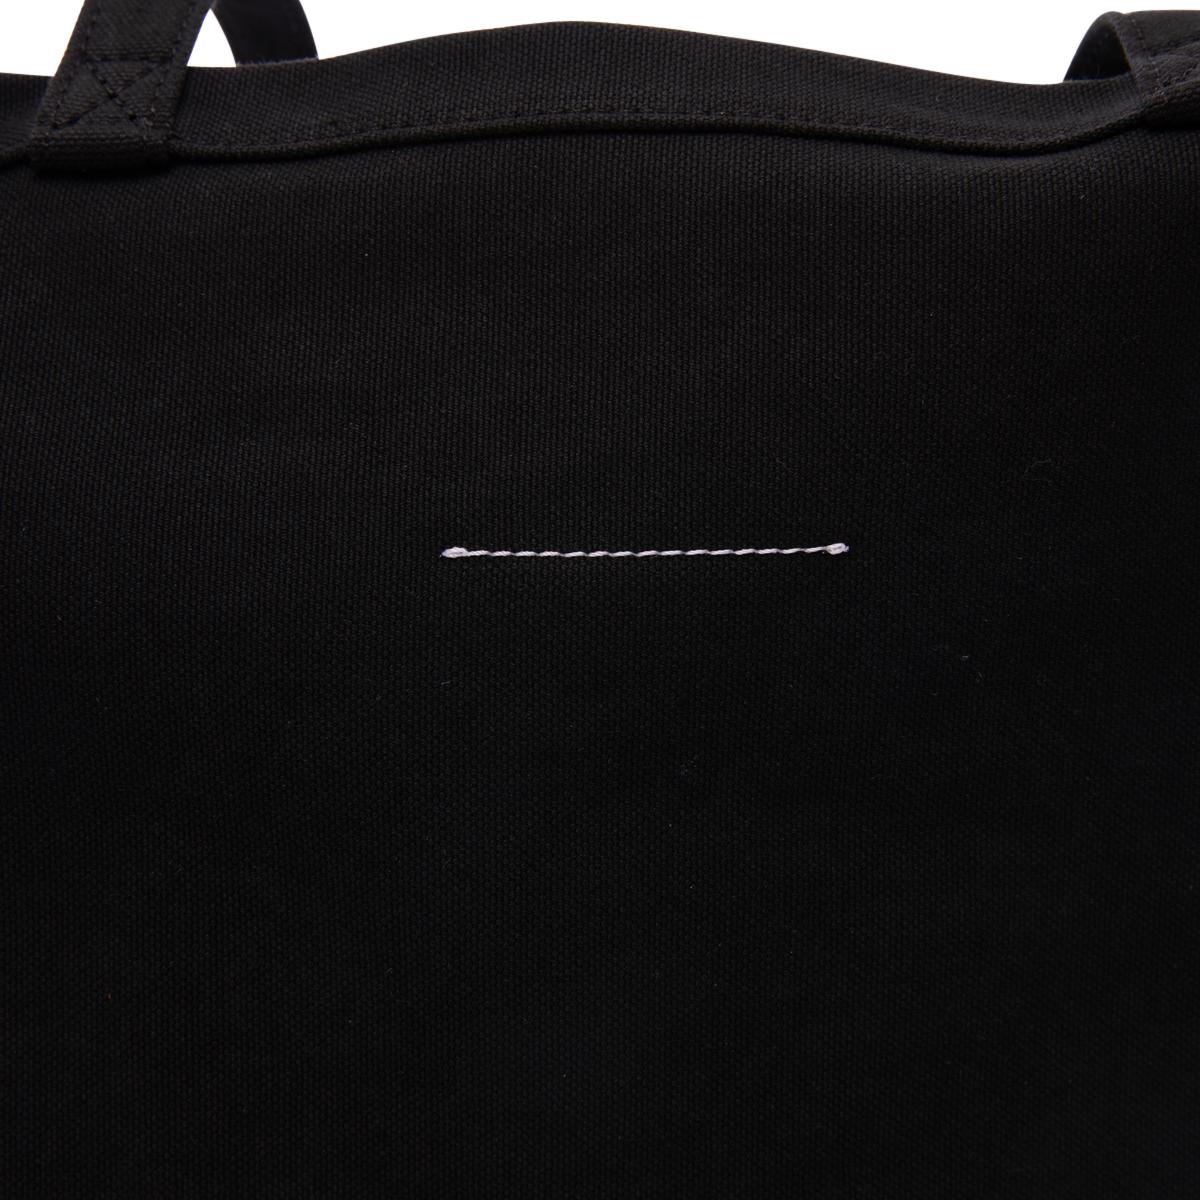 MM6 Maison Margiela 8 Handle Bag - XL